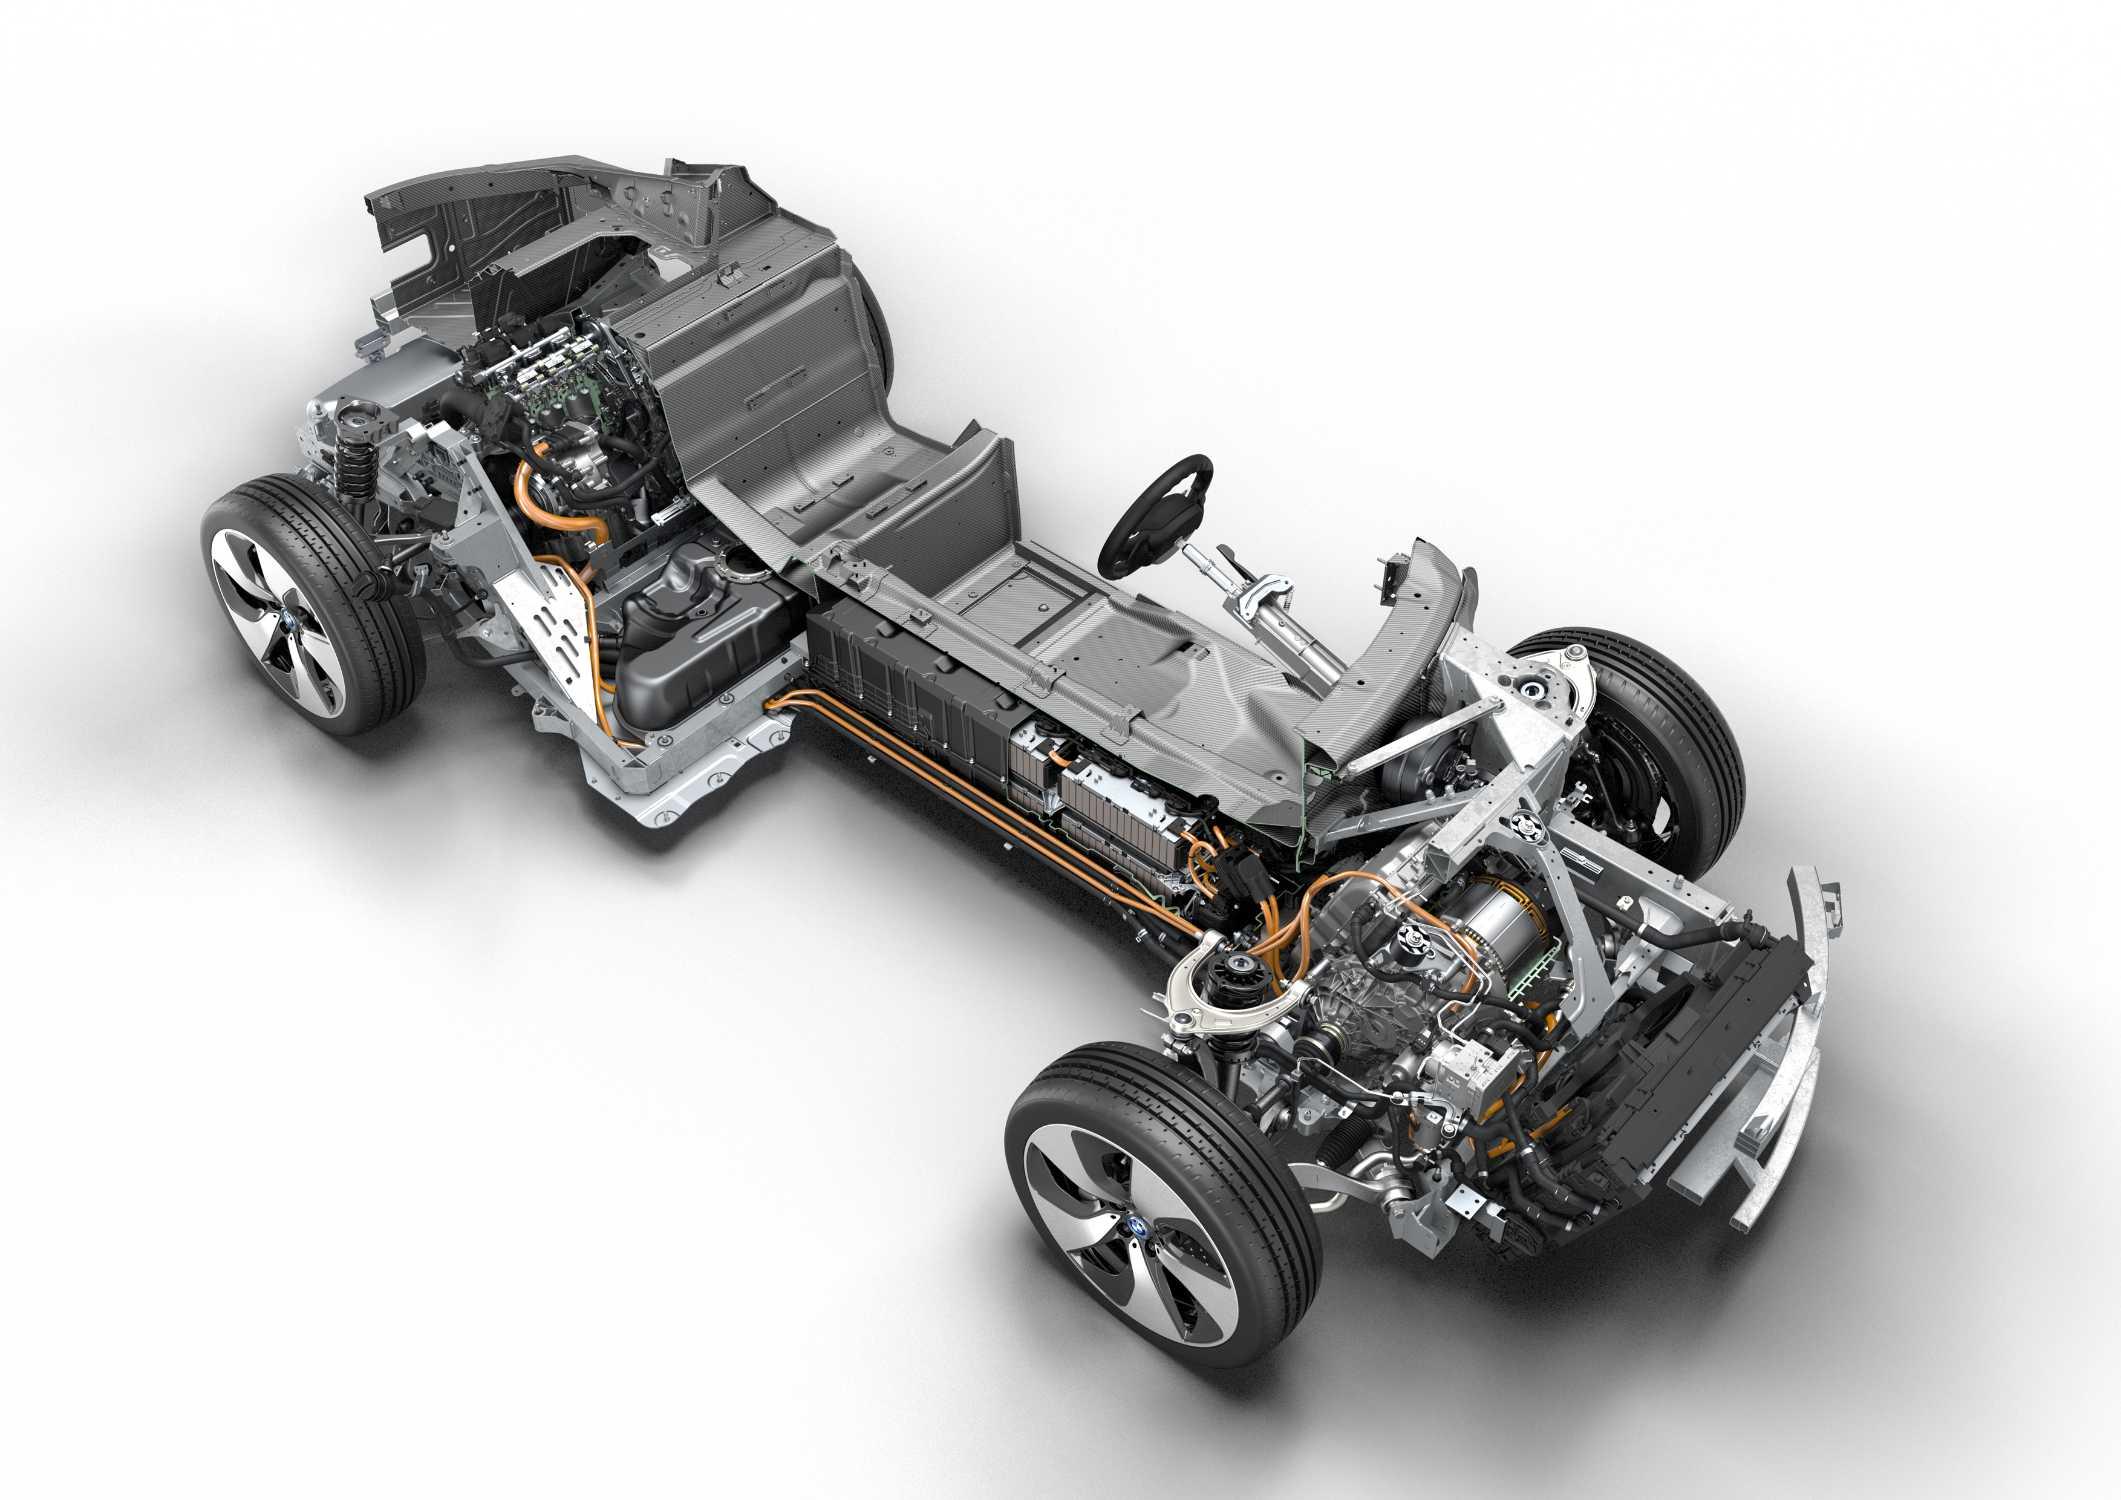 A view of a BMW B38A15T0 1.5L turbocharged I3 Hybrid engine